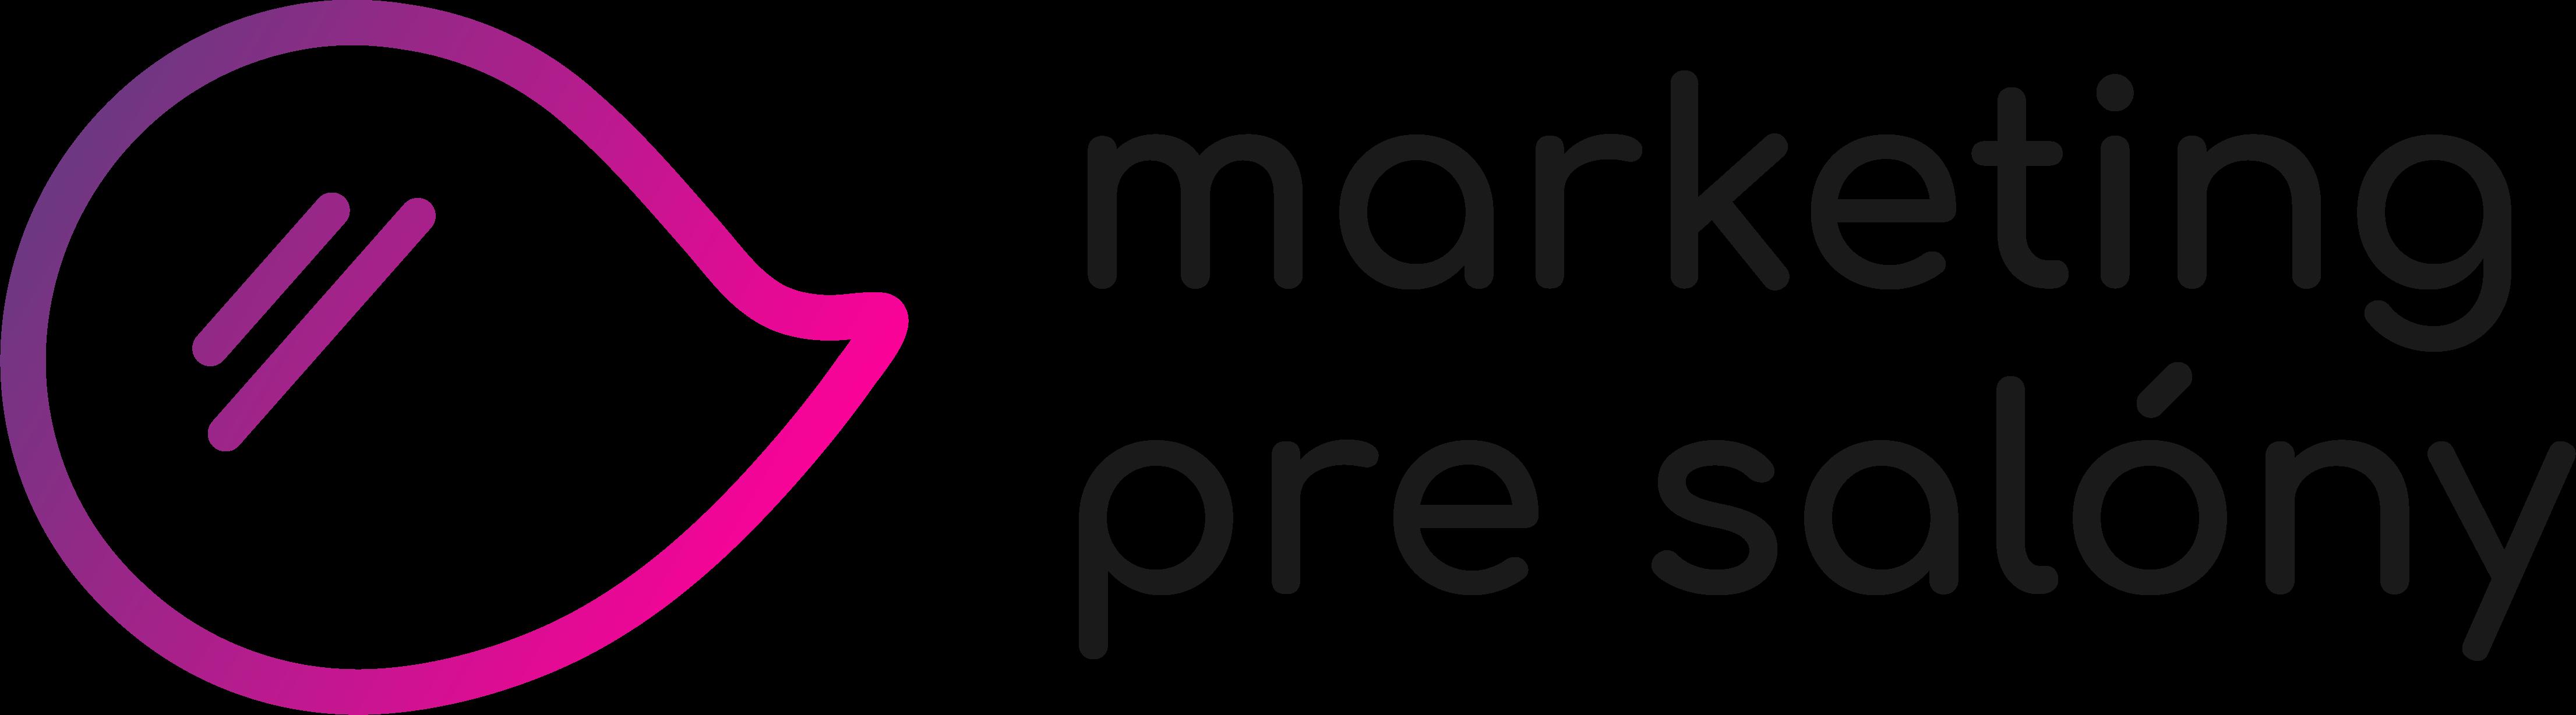 marketing-pre-salony-logo